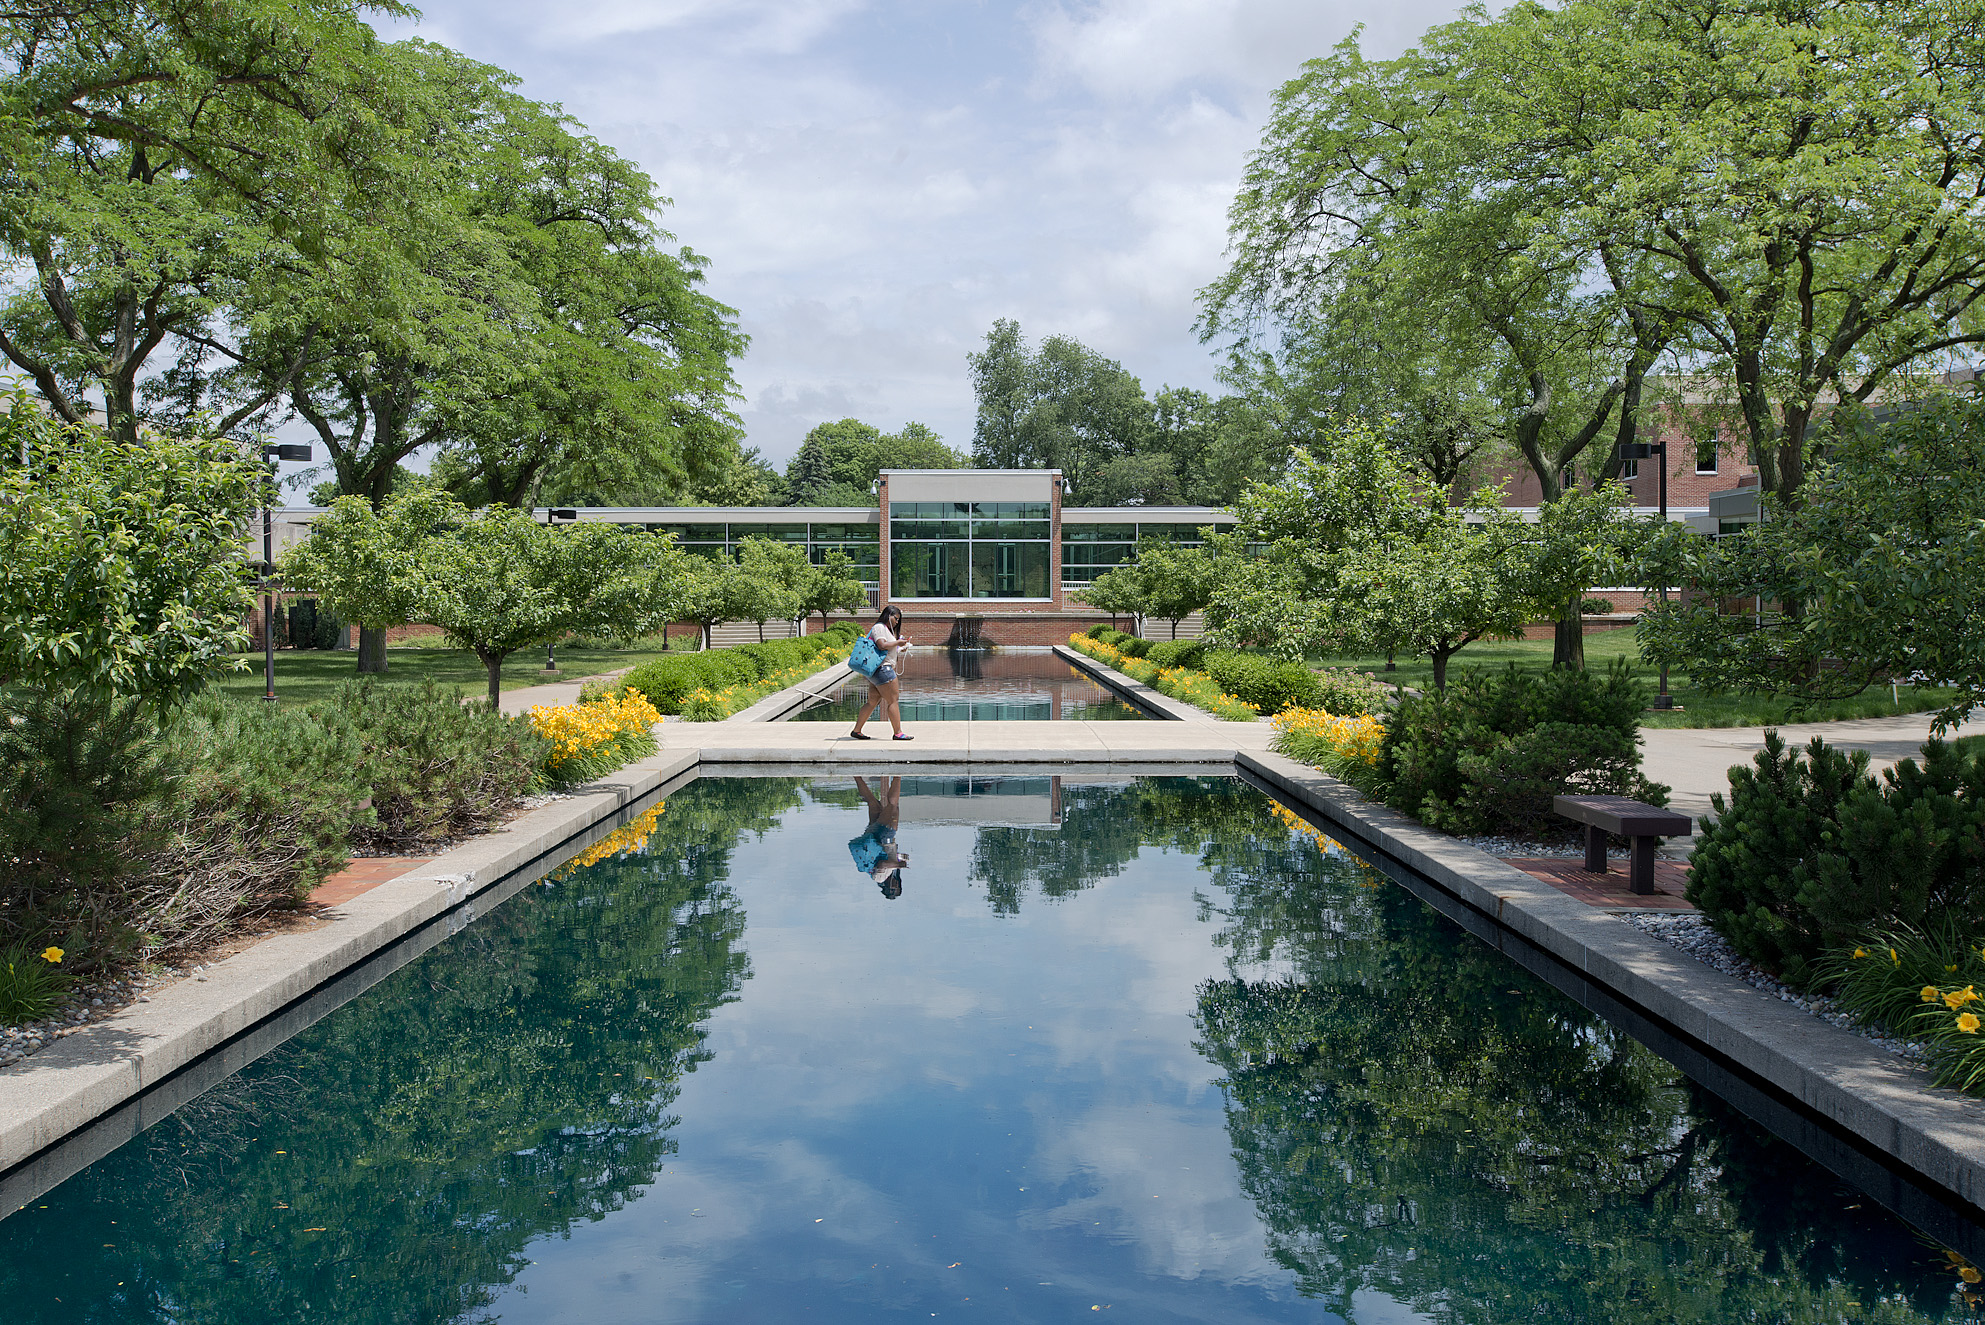 KCC student Kapri Smith walks between reflecting pools on the North Avenue campus.